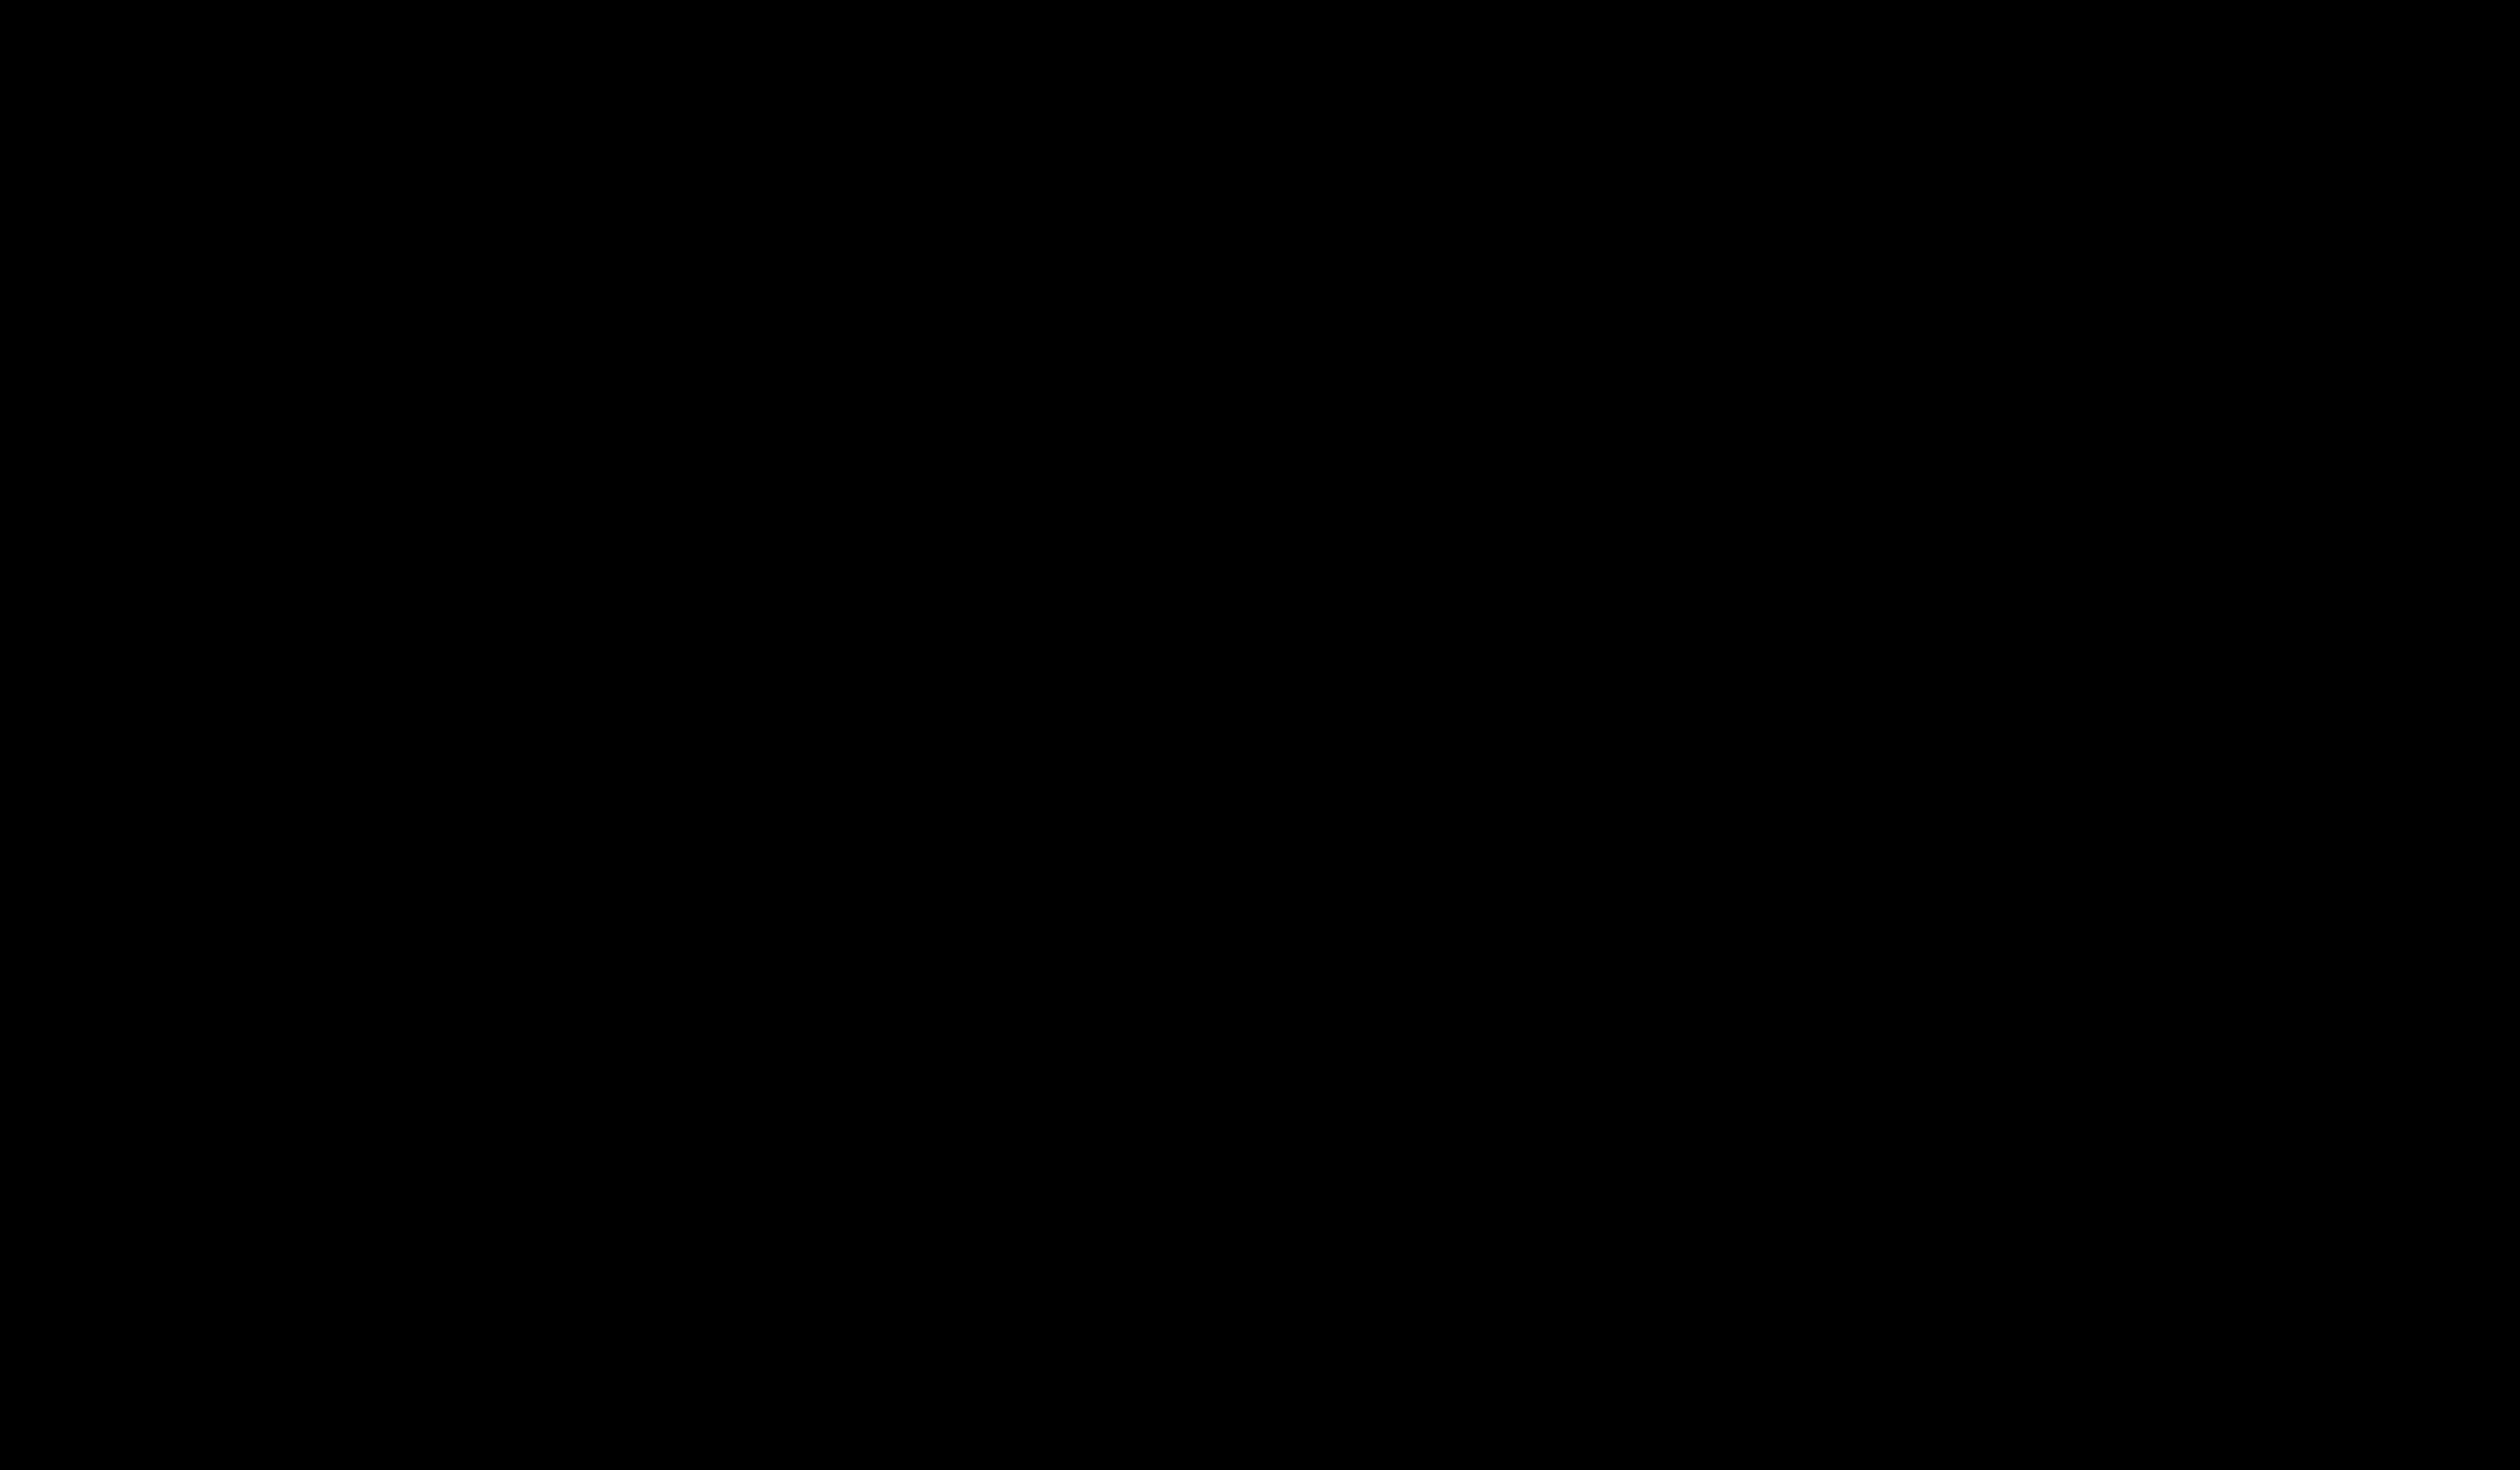 DropFizz Bath Thingz Logo and Branding